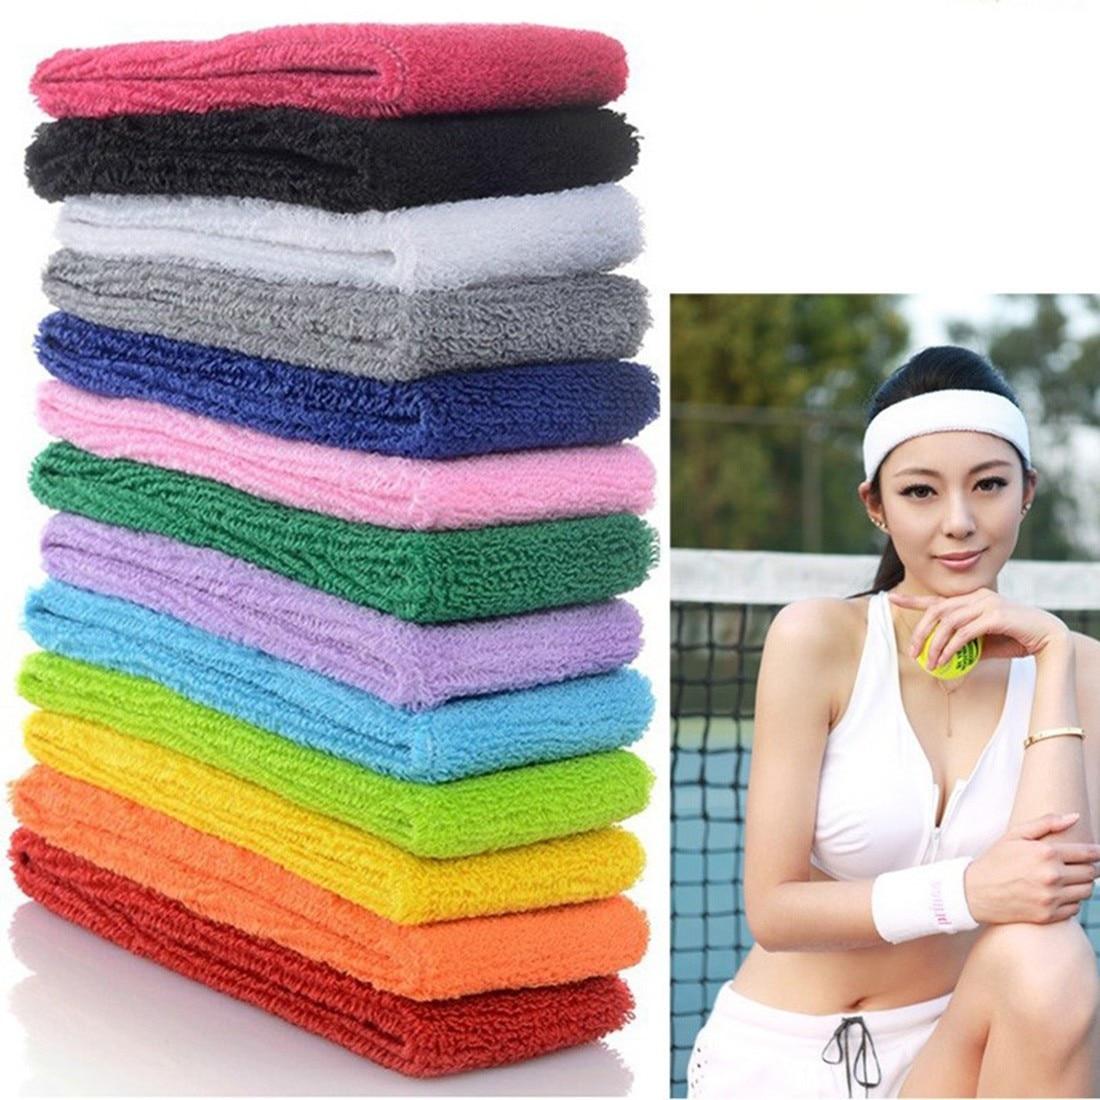 Hot Sale Sports Yoga Gym Stretch Headband Head Band Hair Band Sweat Sweatband Mens Women